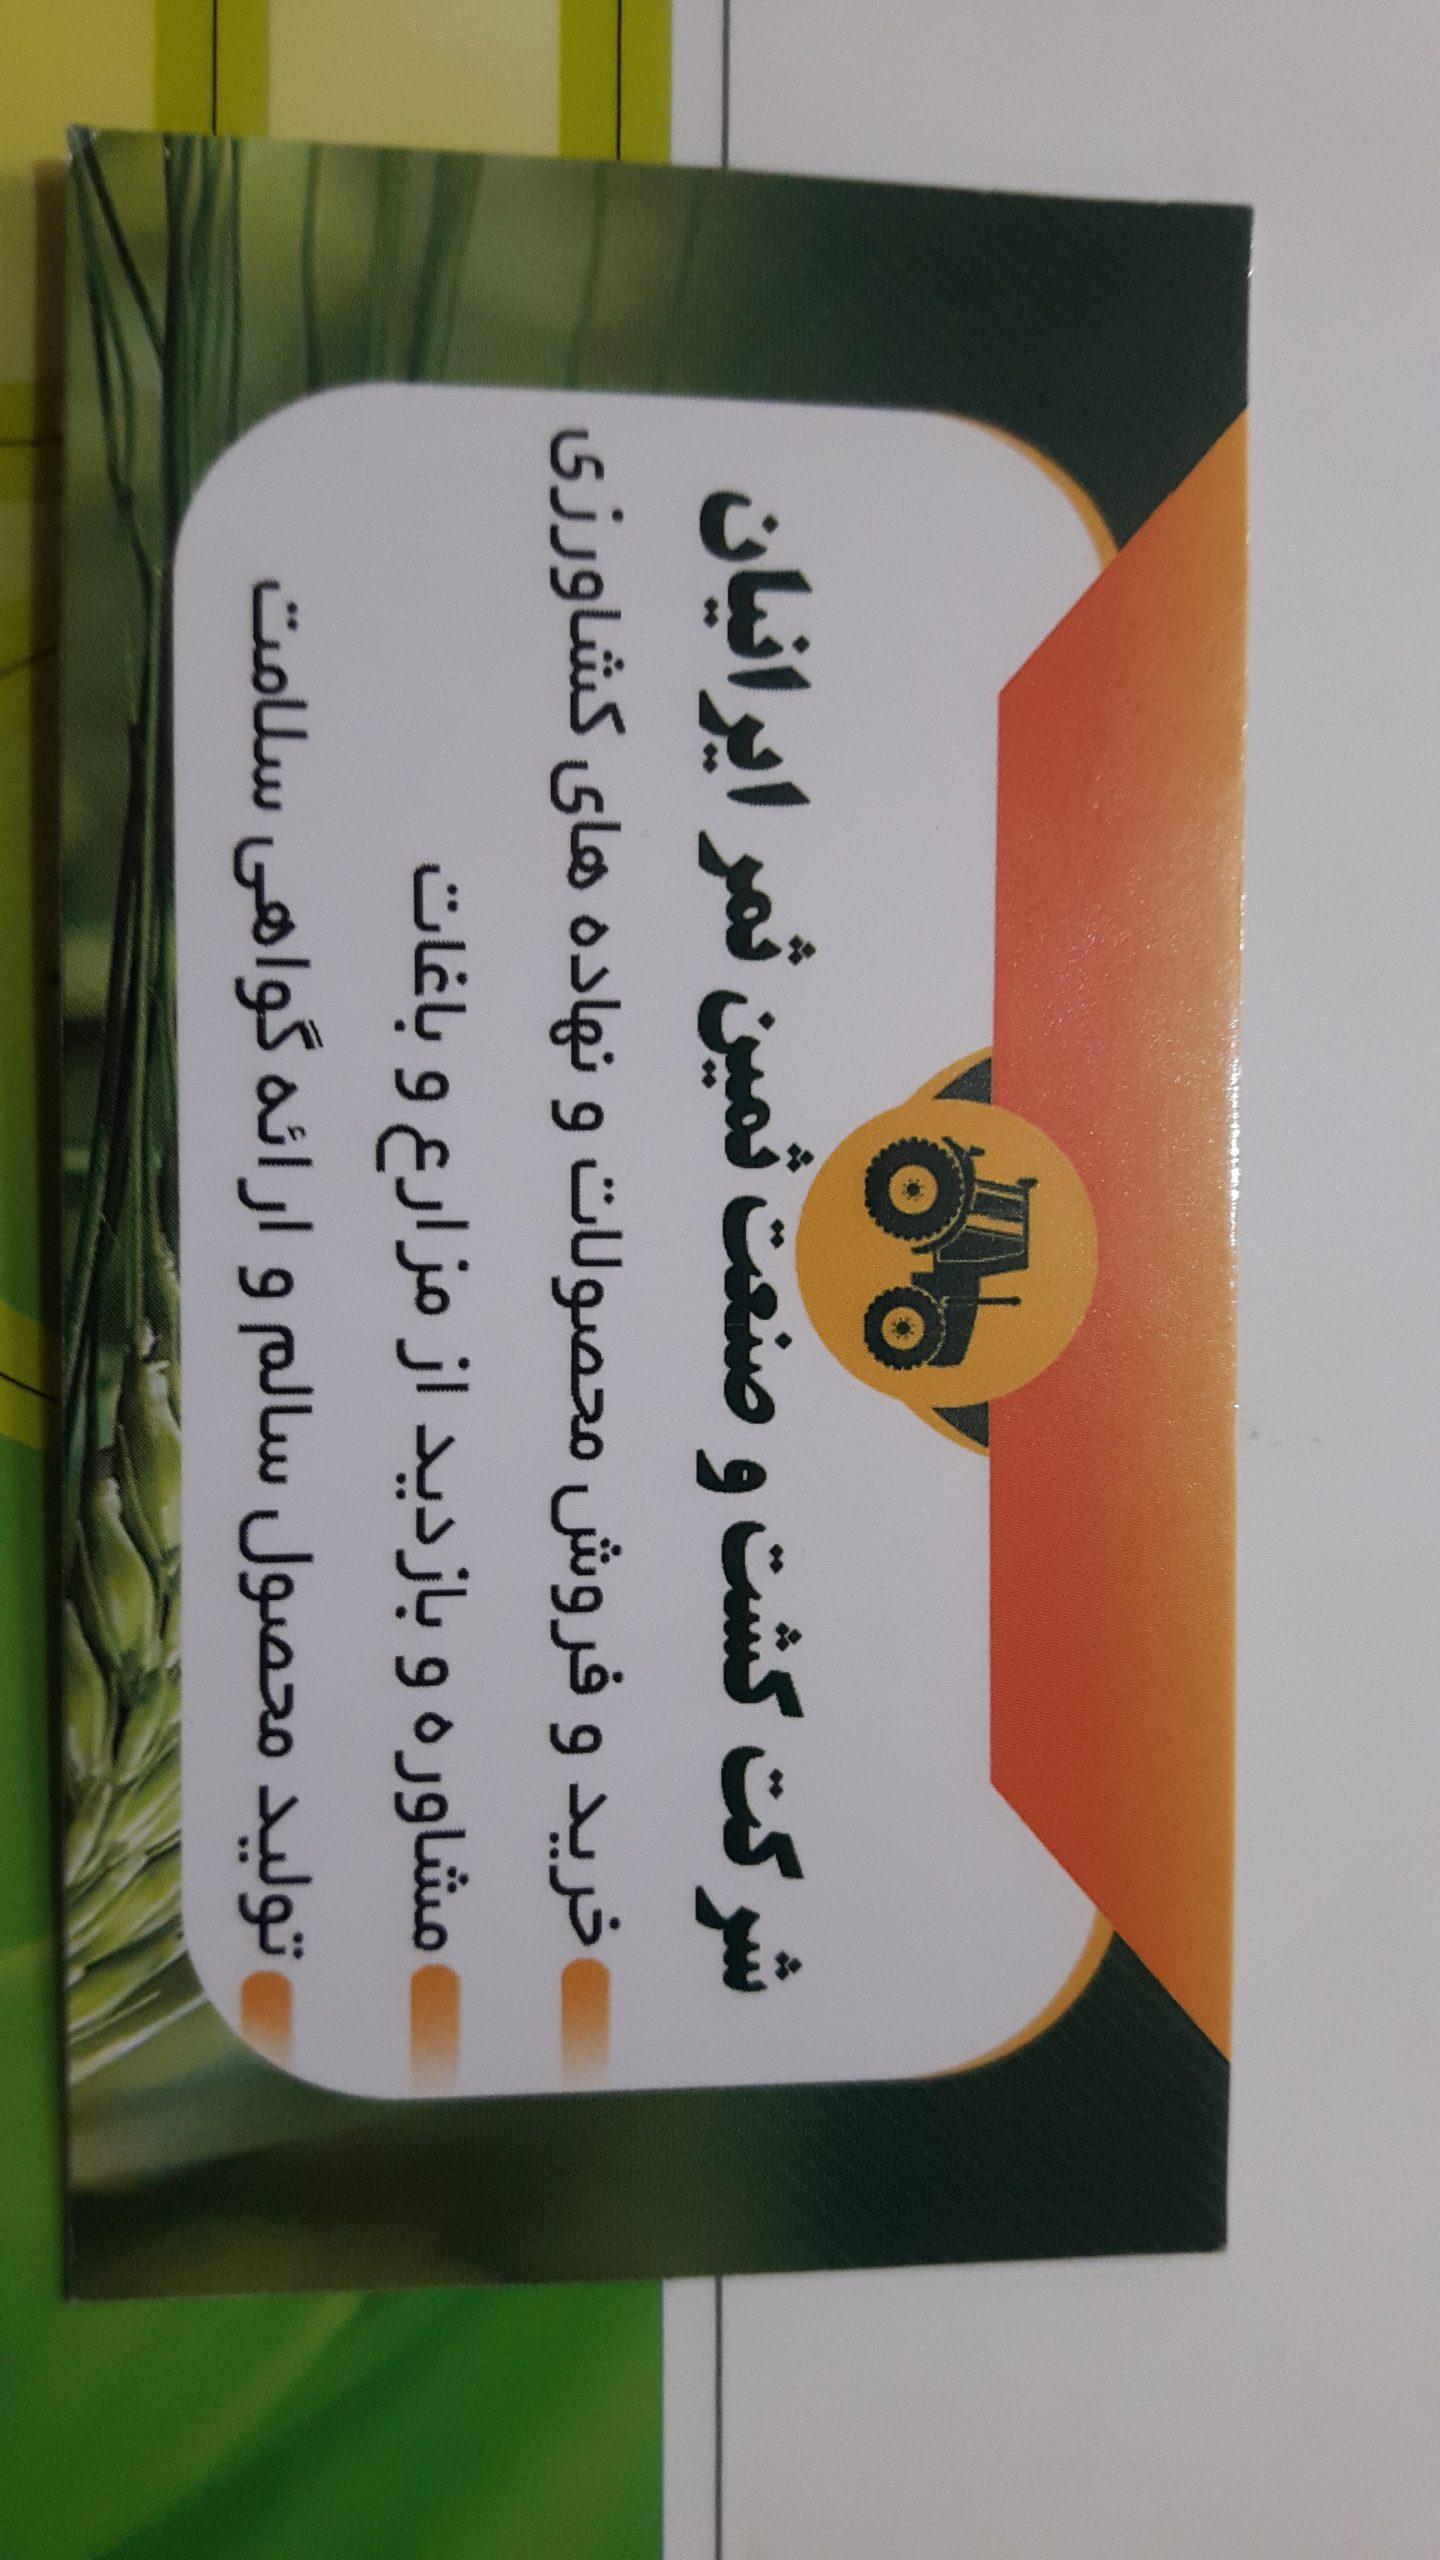 کشت و صنعت ثمین ثمر ایرانیان